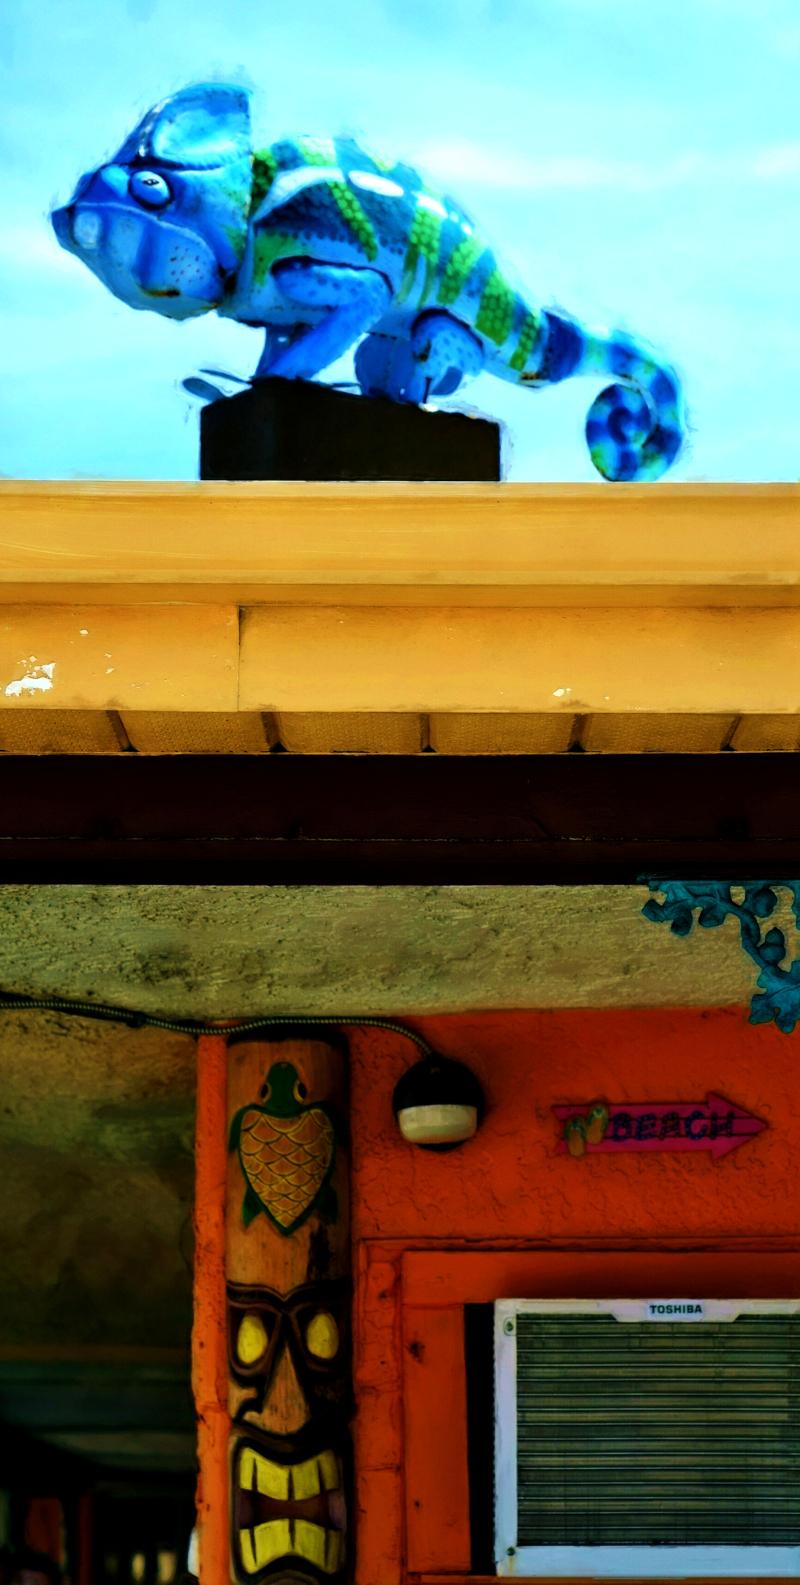 03_21 blue lizard and beach DSC06379 watercolor